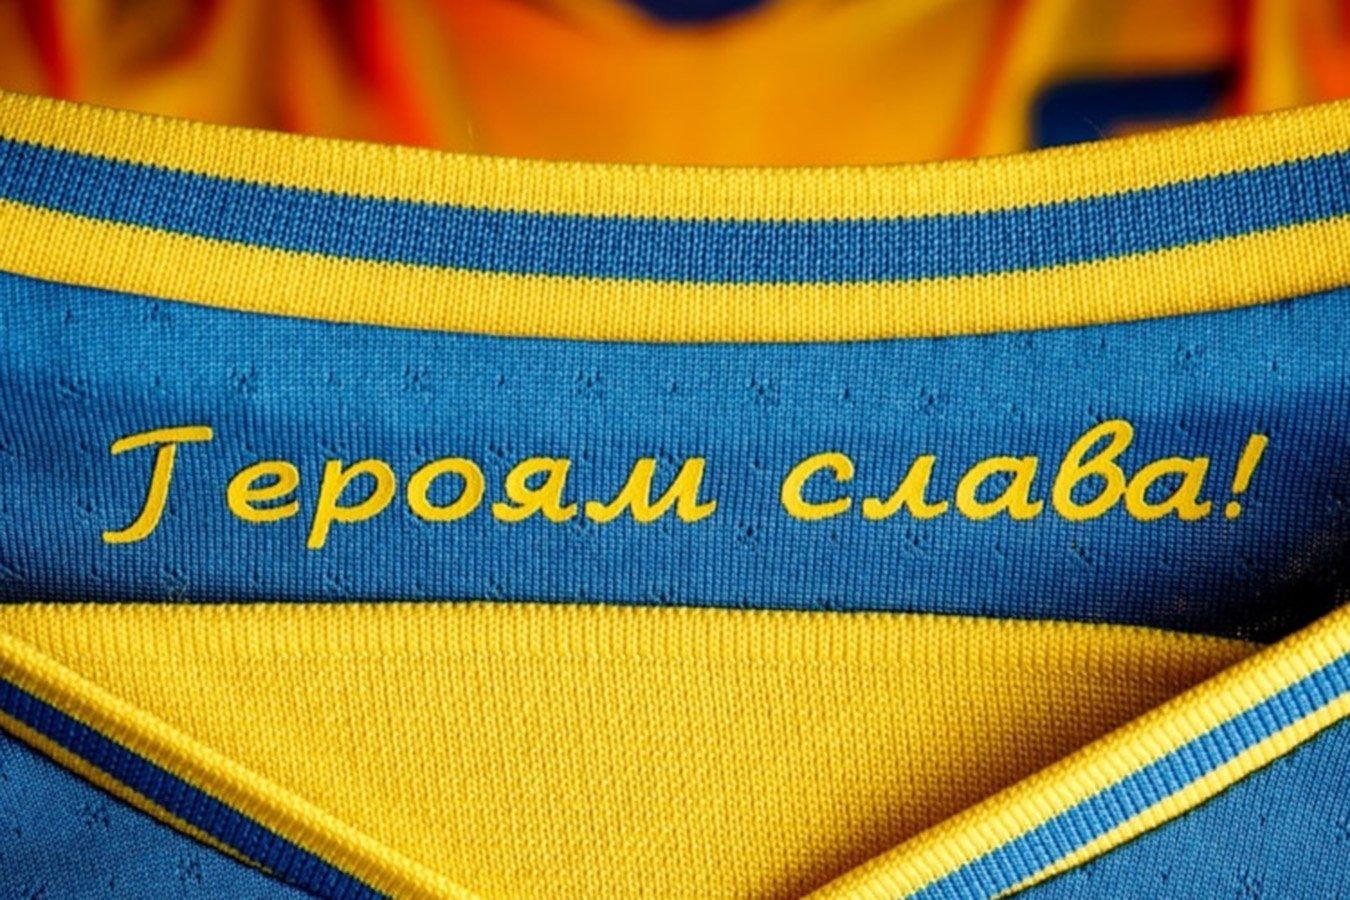 В Госдуме отреагировали на призыв нанести на форму украинских клубов фразу Героям Слава!